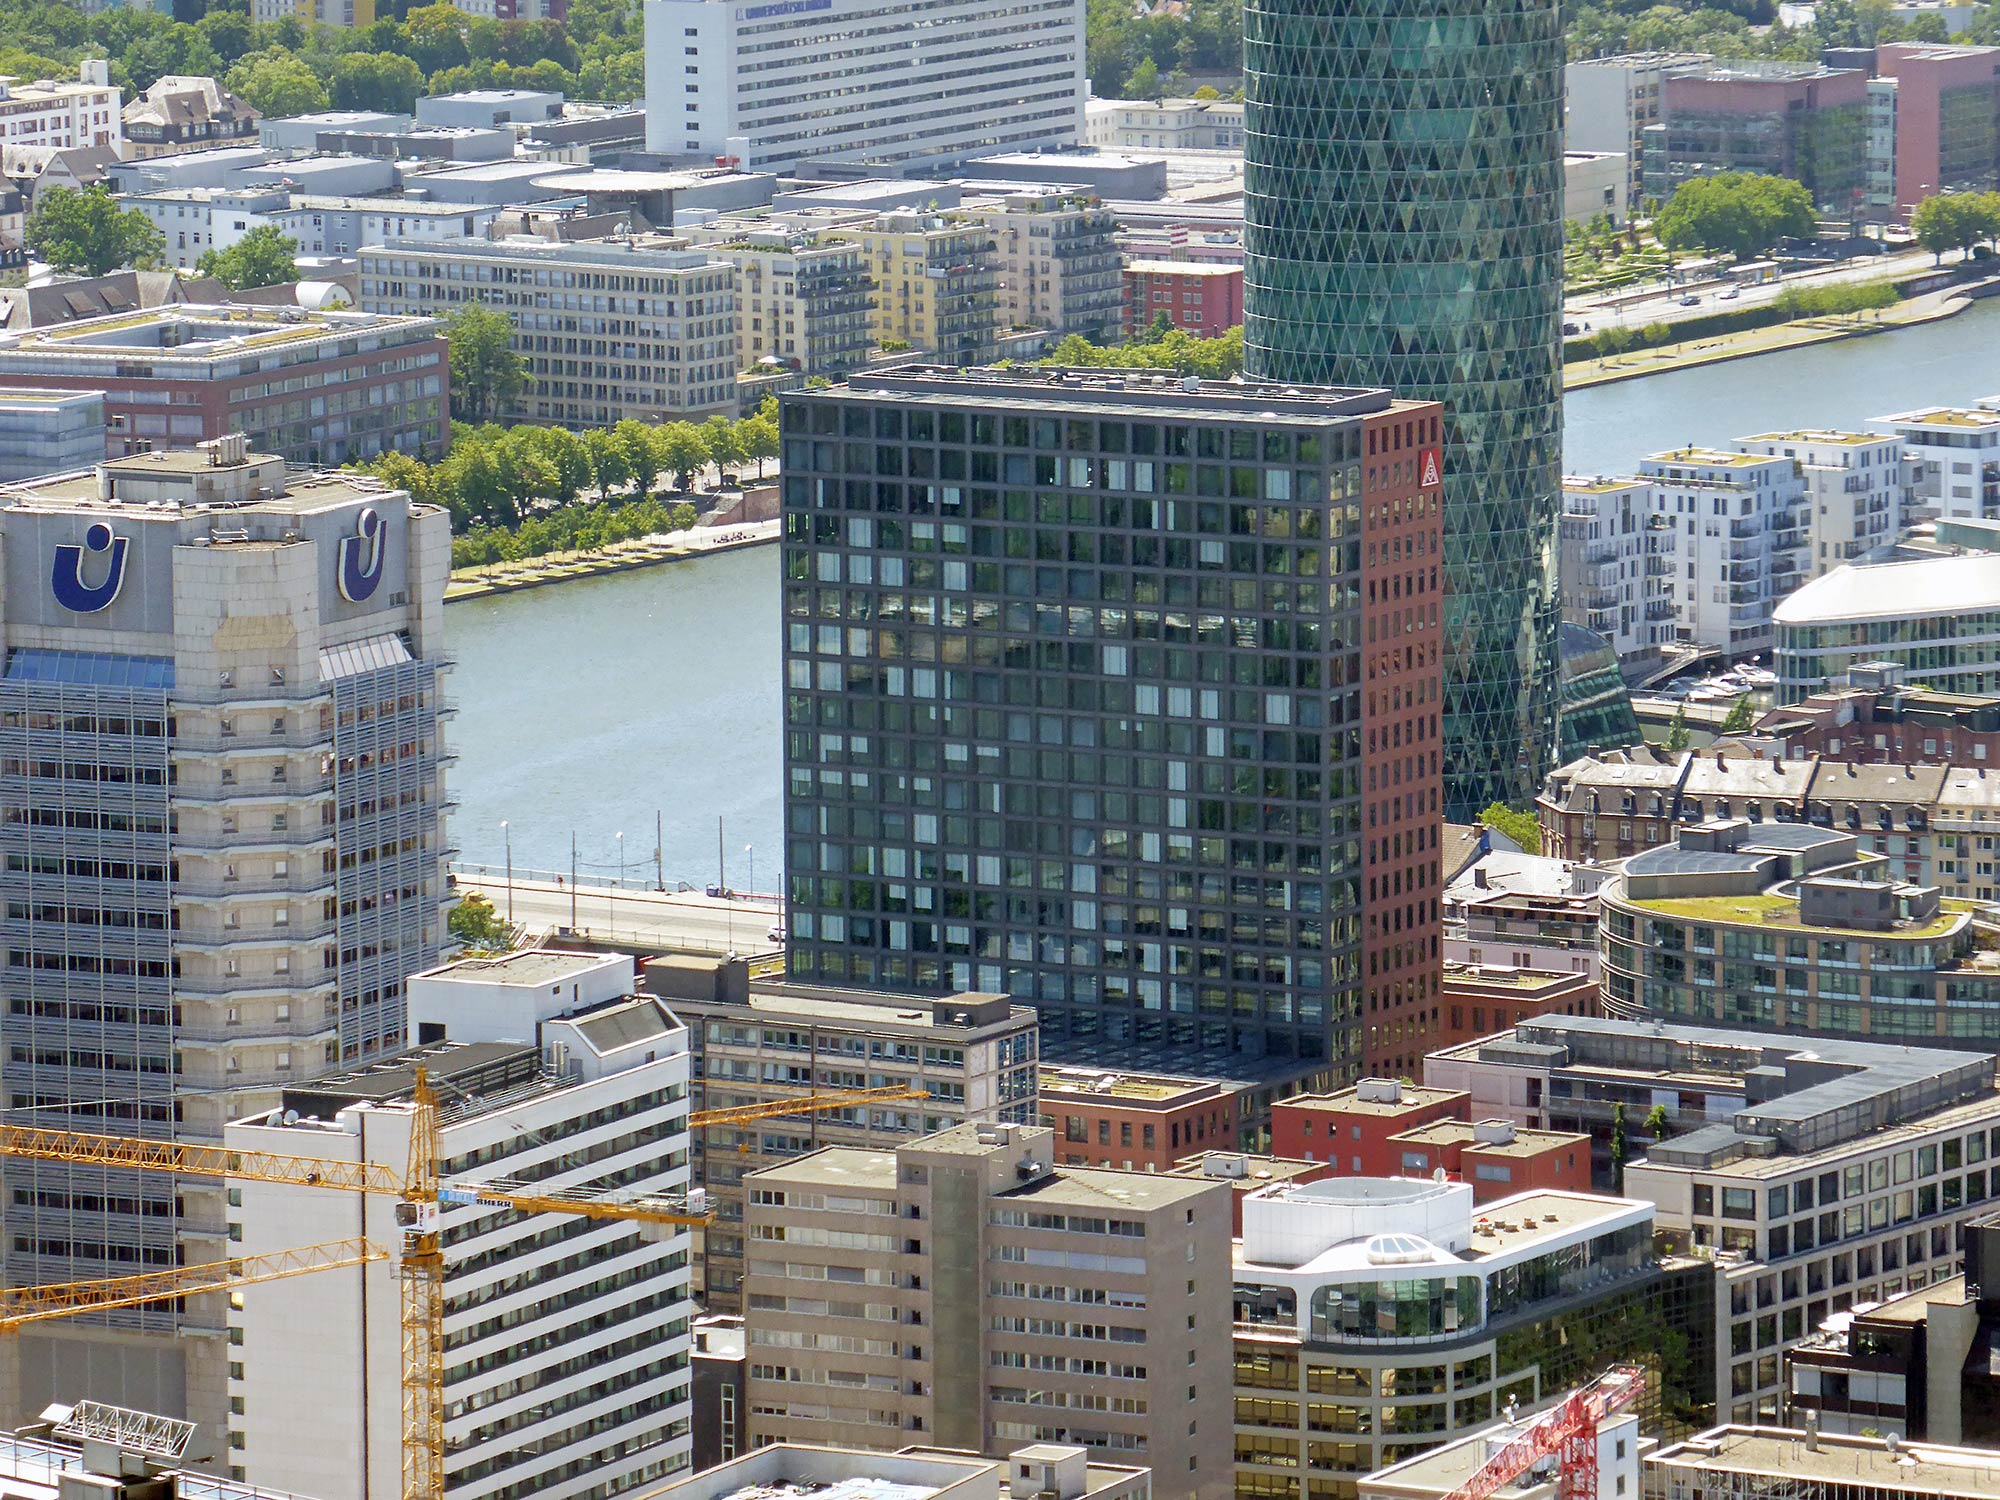 Mainforum Frankfurt am Main - Hochhaus der IG Metall - Hauptsitz